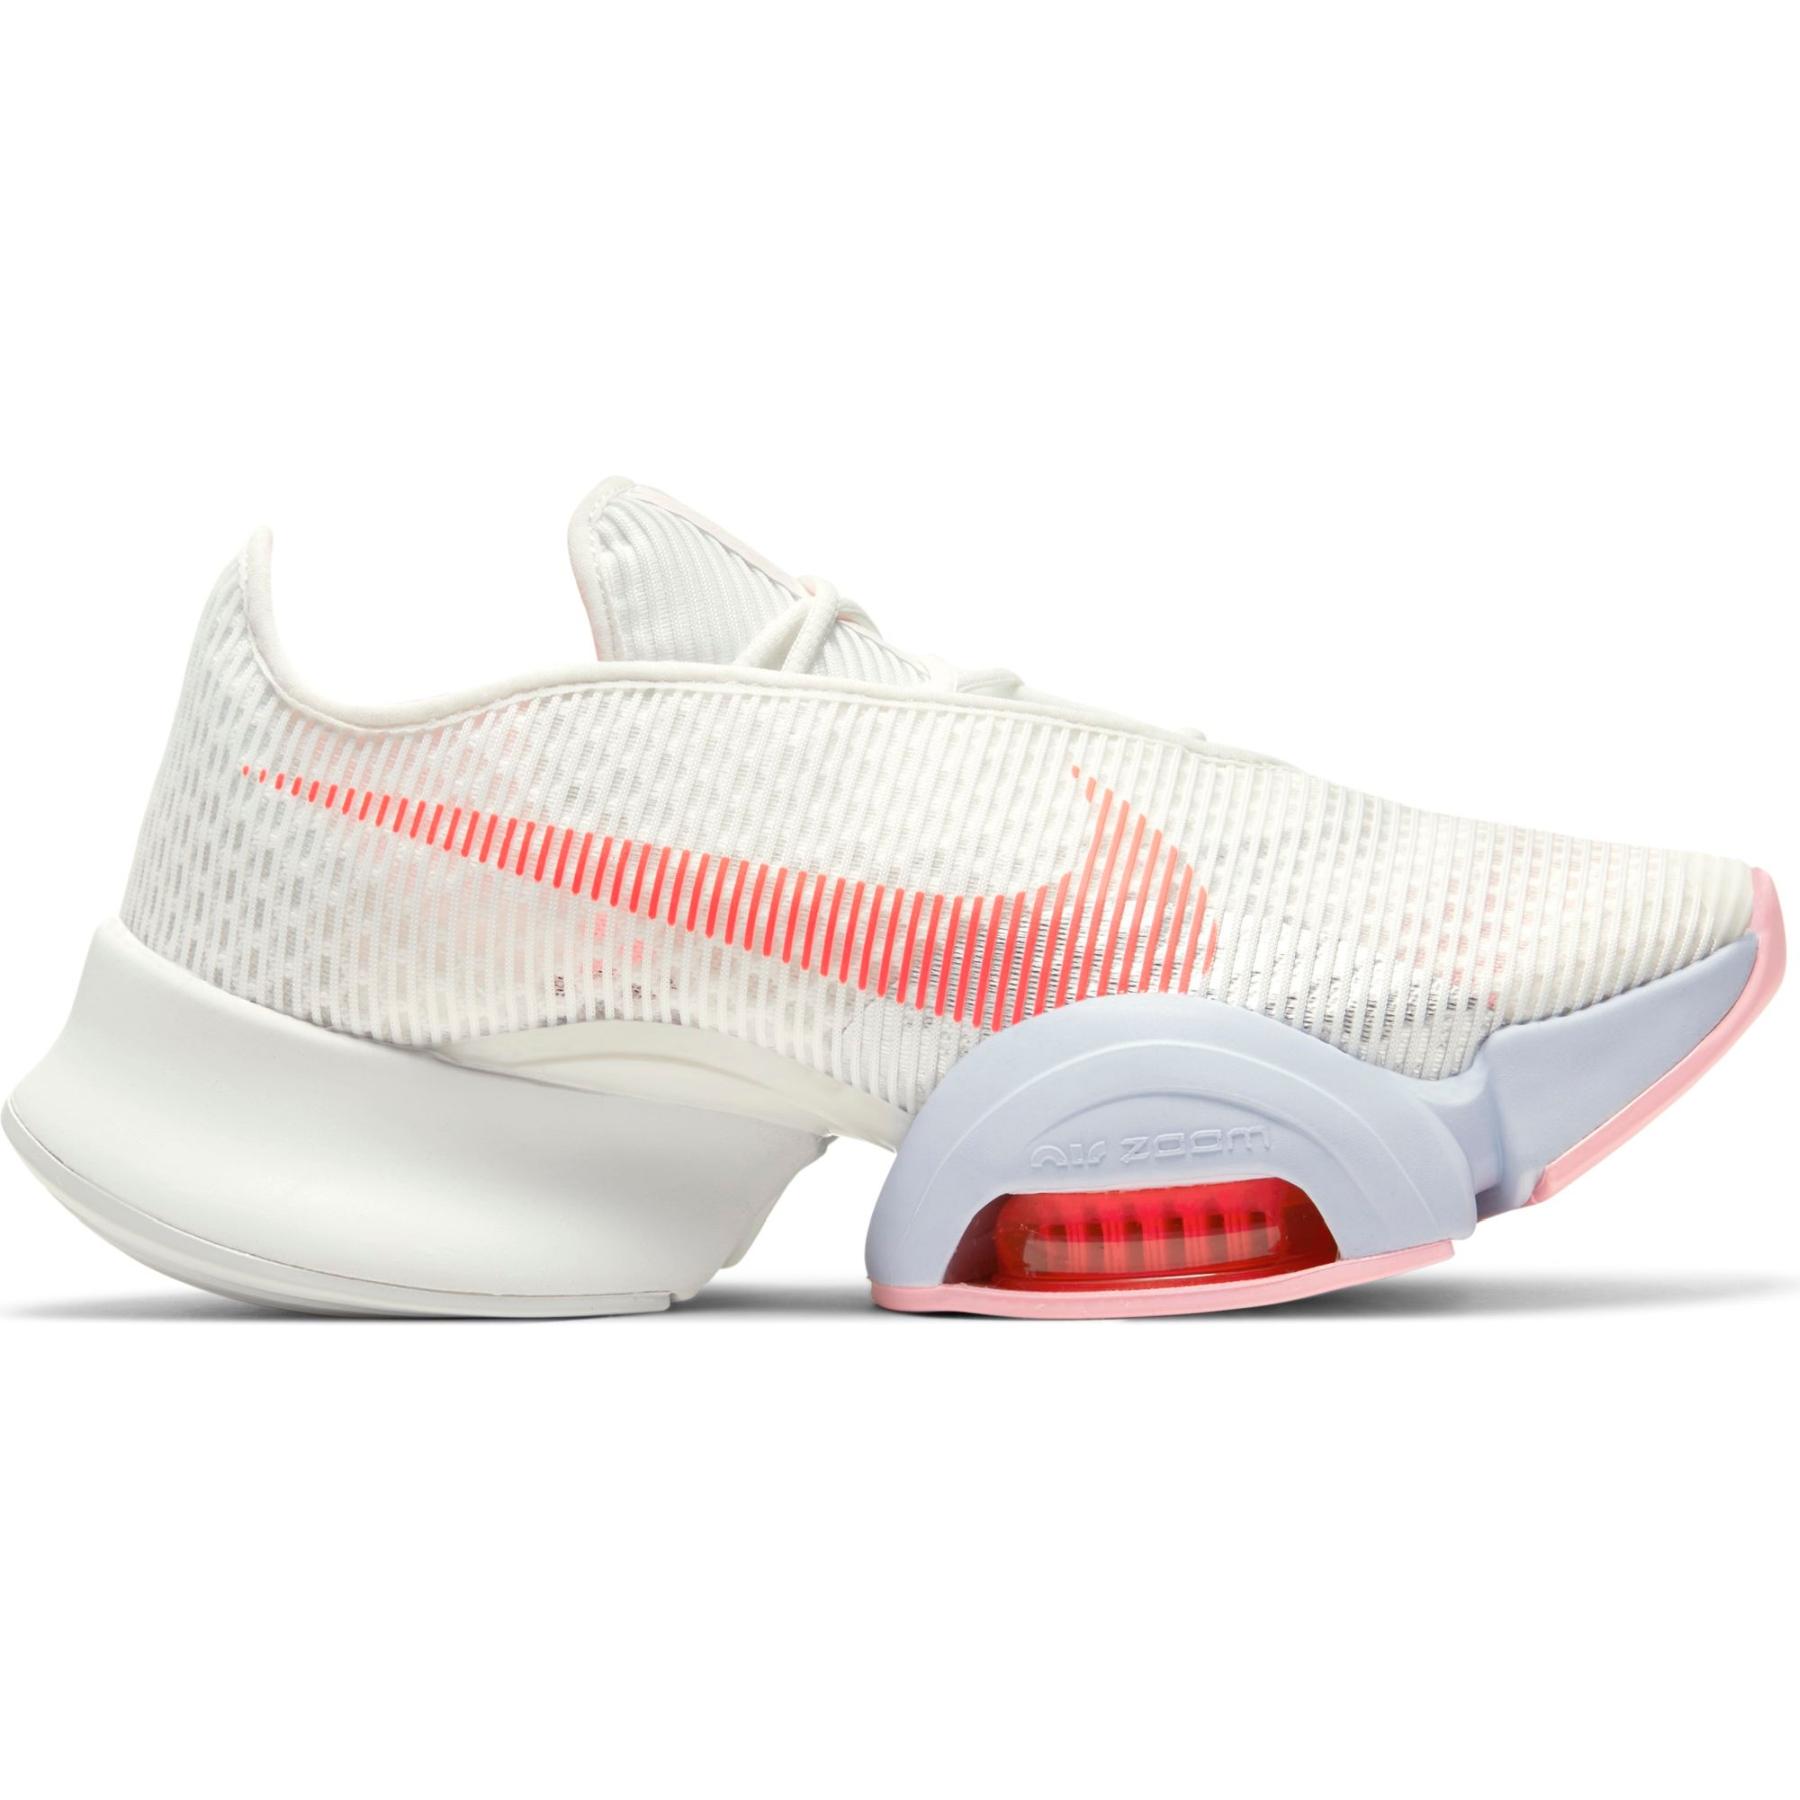 Foto de Nike Air Zoom Superrep 2 Zapatillas para Mujer - summit white/bright crimson CU5925-100